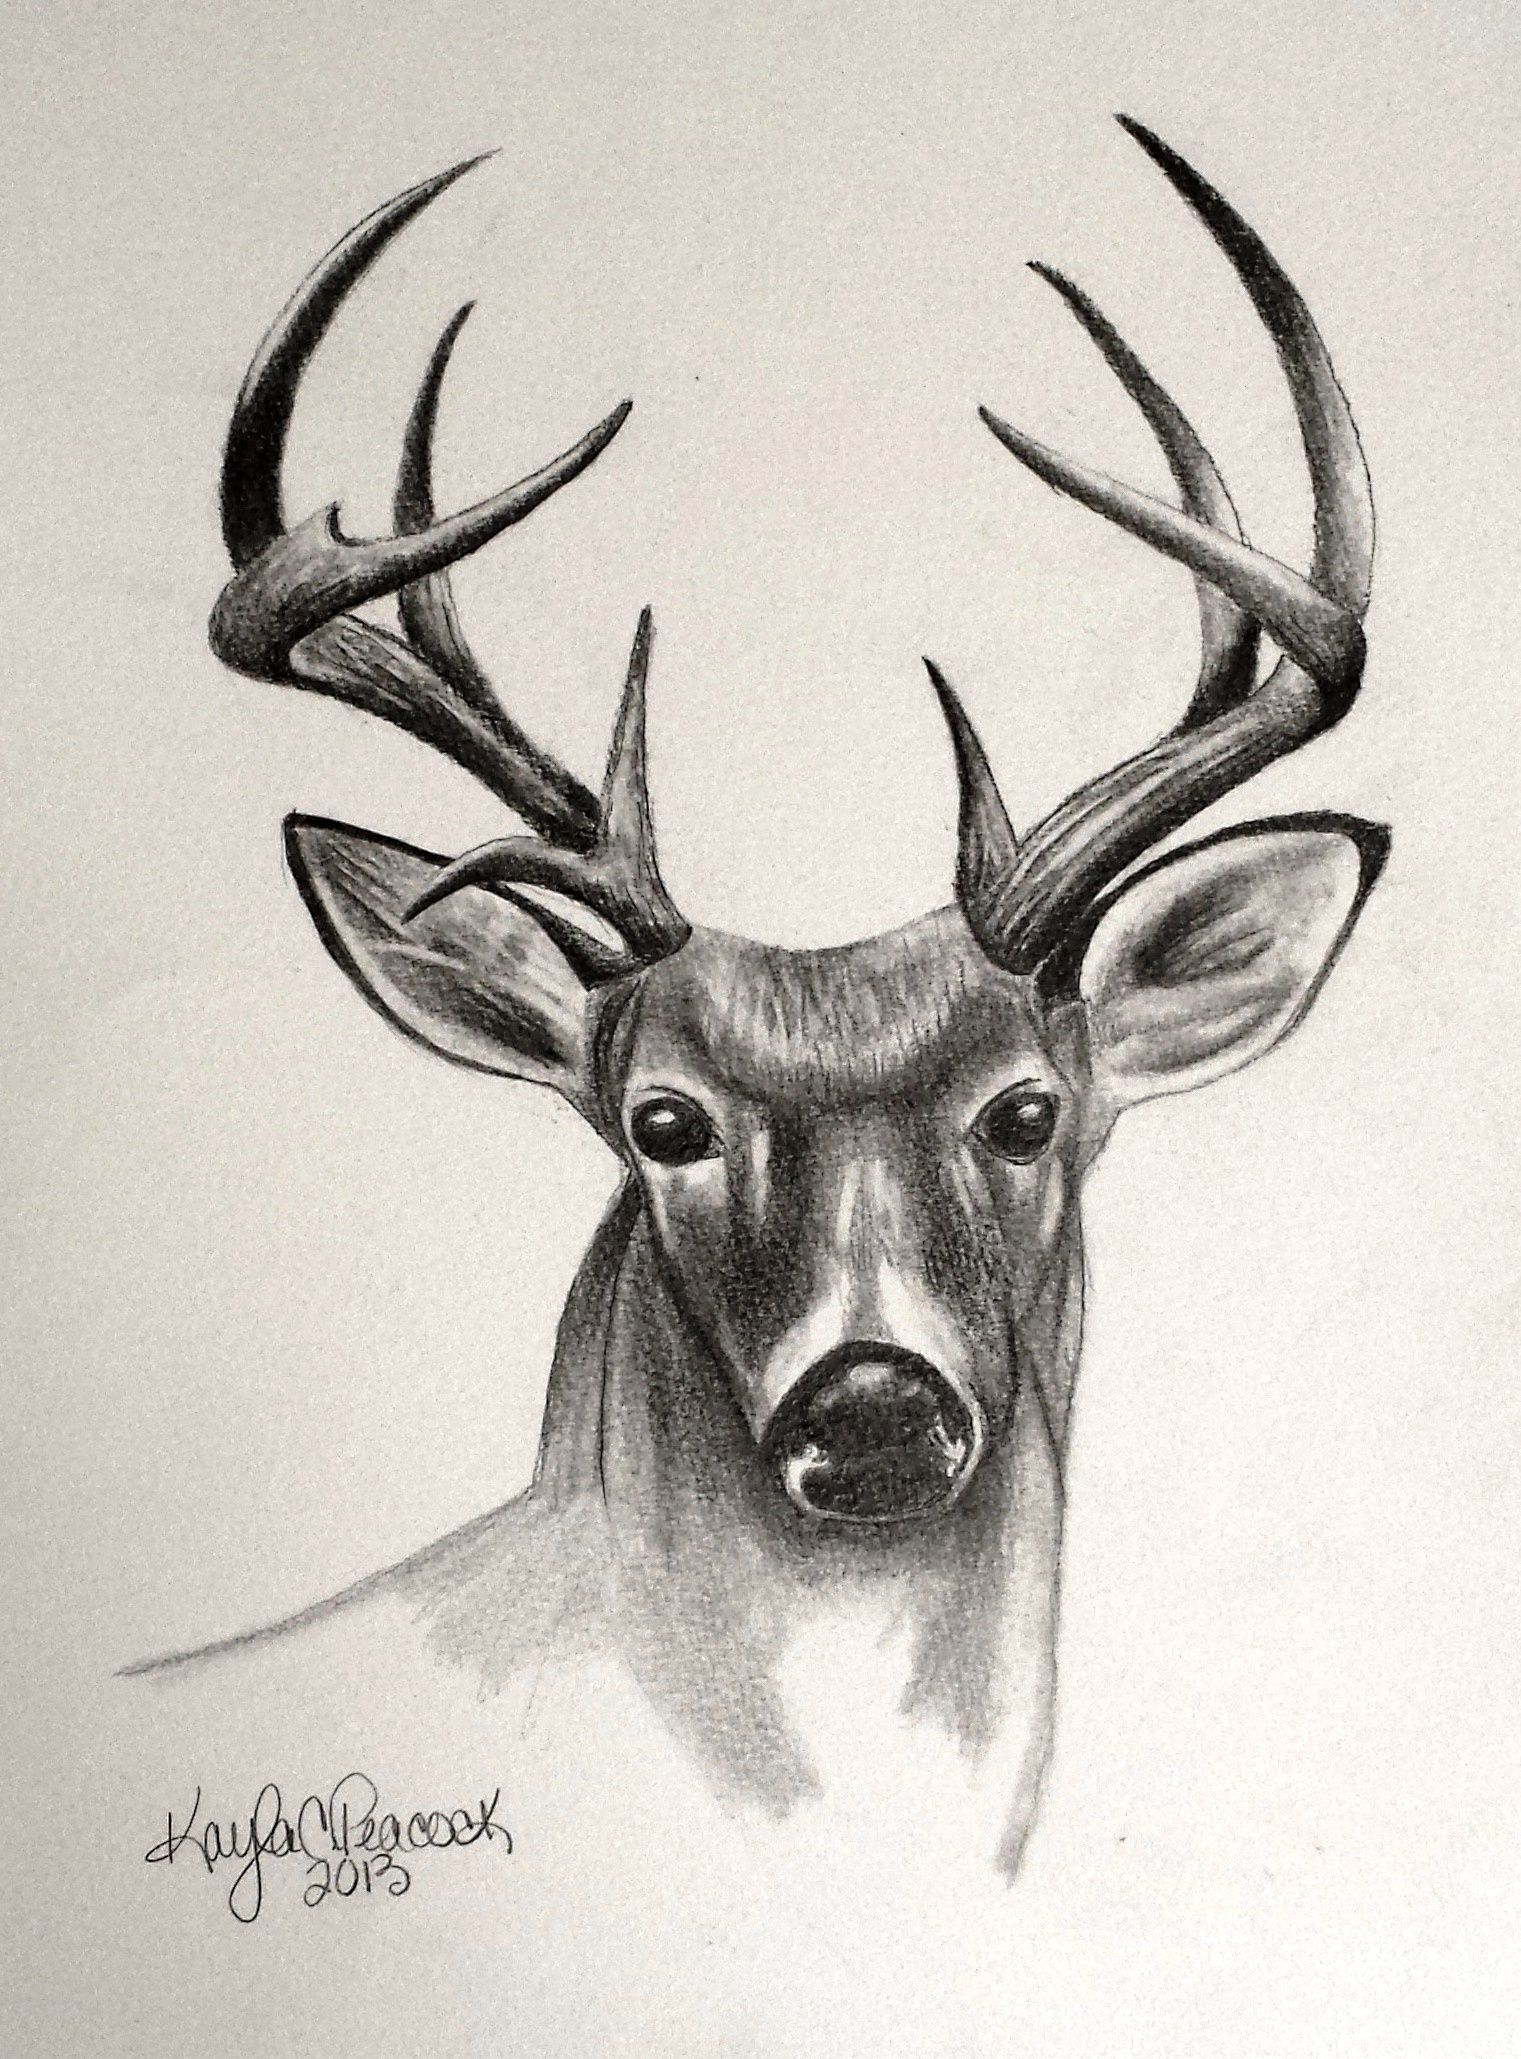 deer sketches bing images deer sketches pinterest deer drawing deer sketch and deer. Black Bedroom Furniture Sets. Home Design Ideas